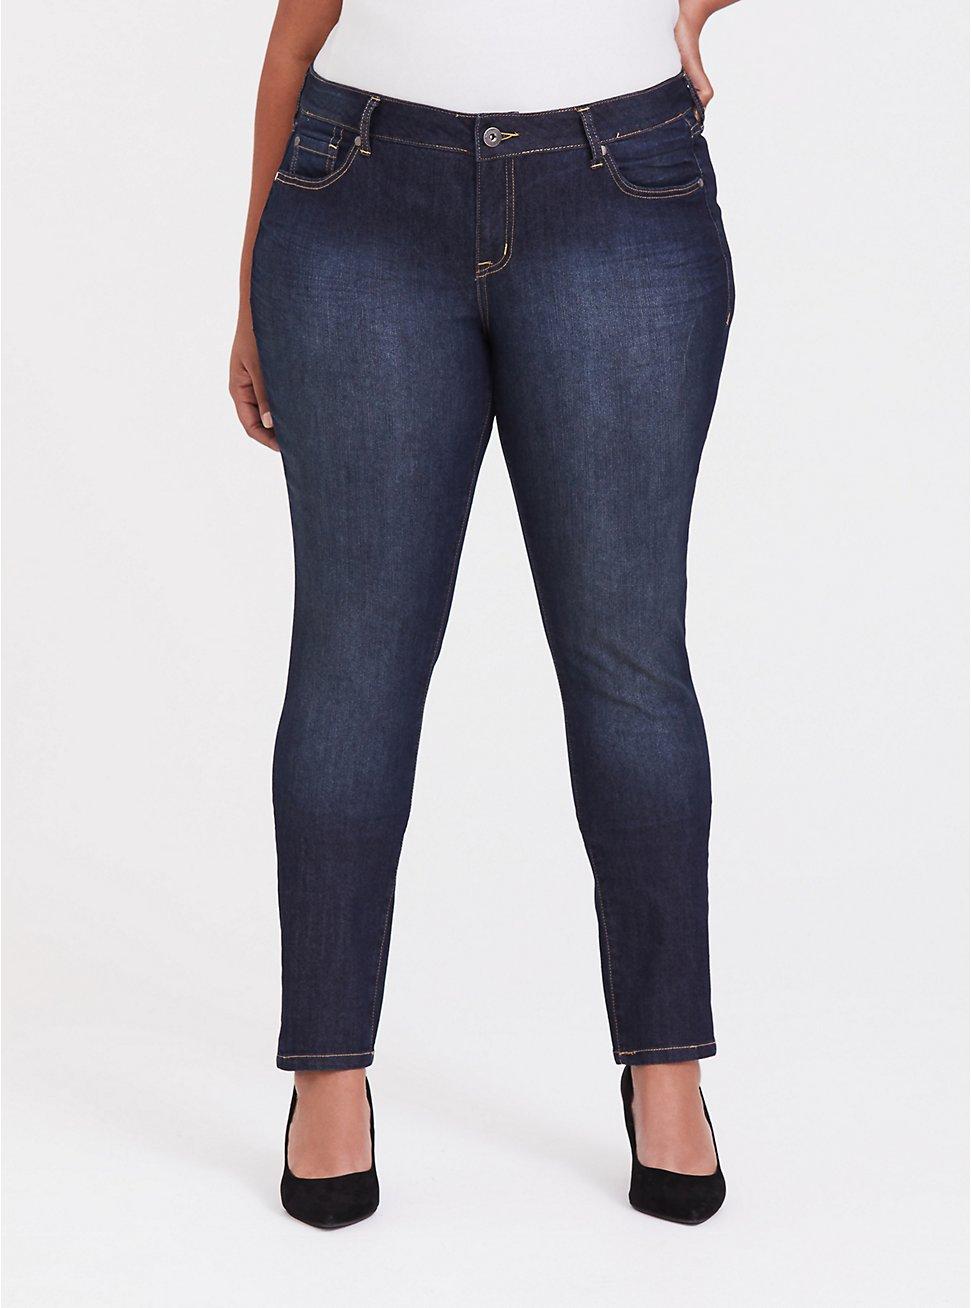 Plus Size Curvy Skinny Jean - Super Stretch Dark Wash, DUSK, hi-res